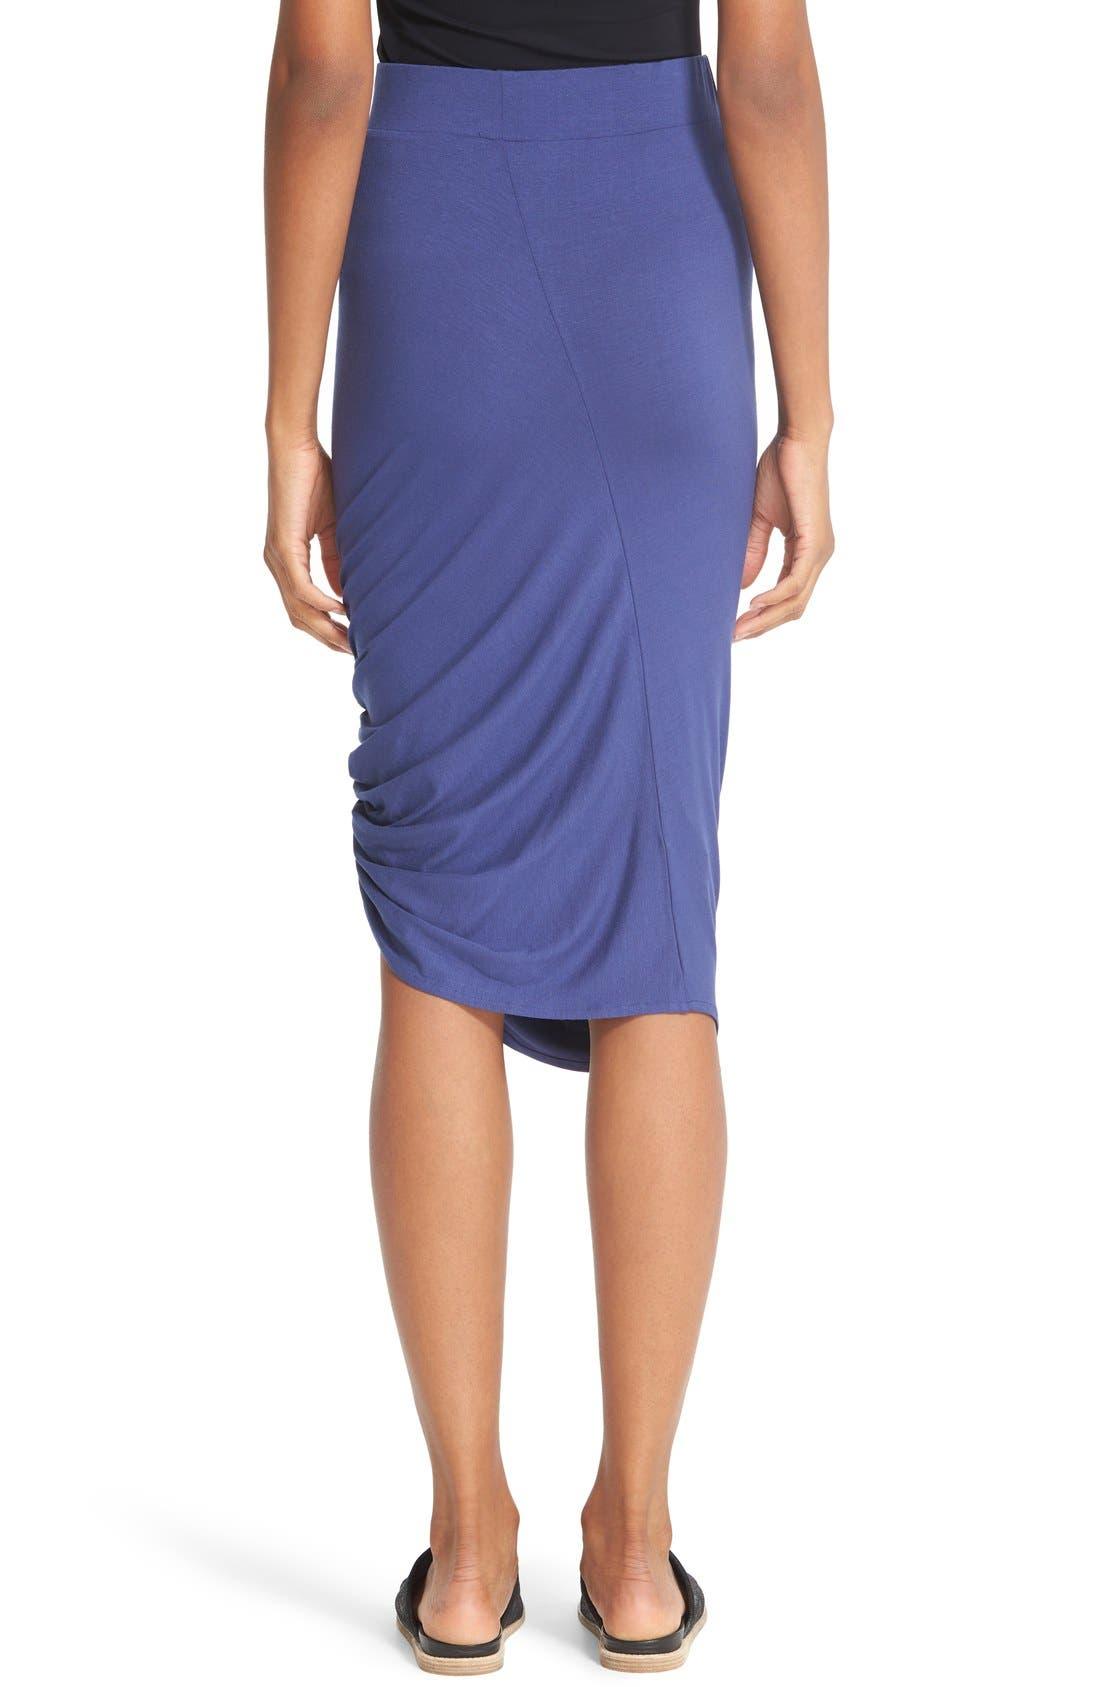 Alternate Image 2  - Zero + Maria Cornejo 'Kia' Ruched Sim Jersey Skirt